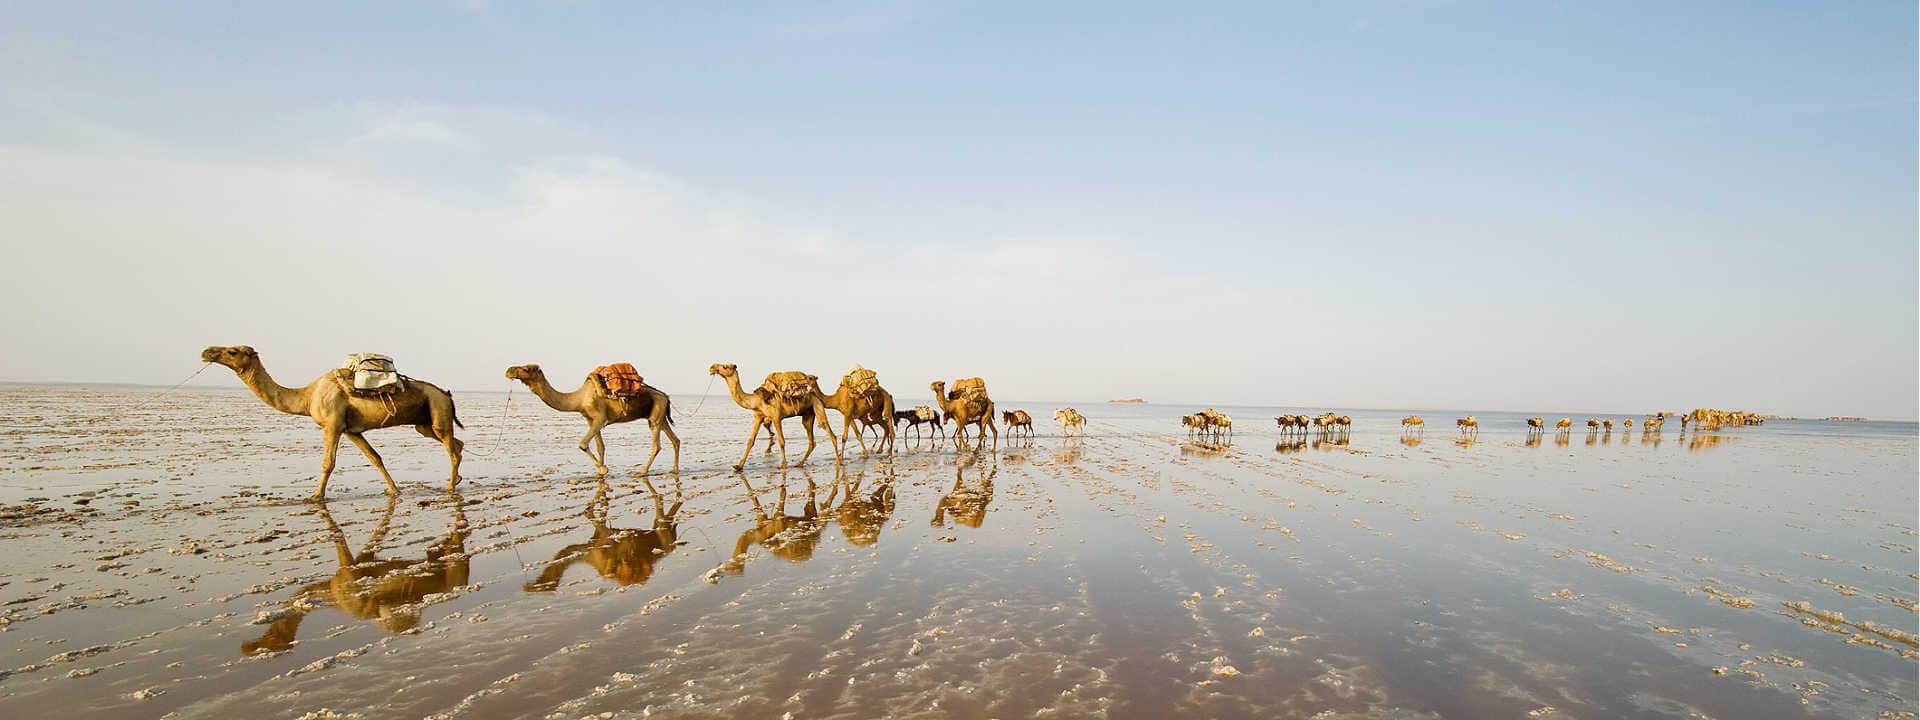 Camel train at Lac Abbe -desert adventures in Djibouti